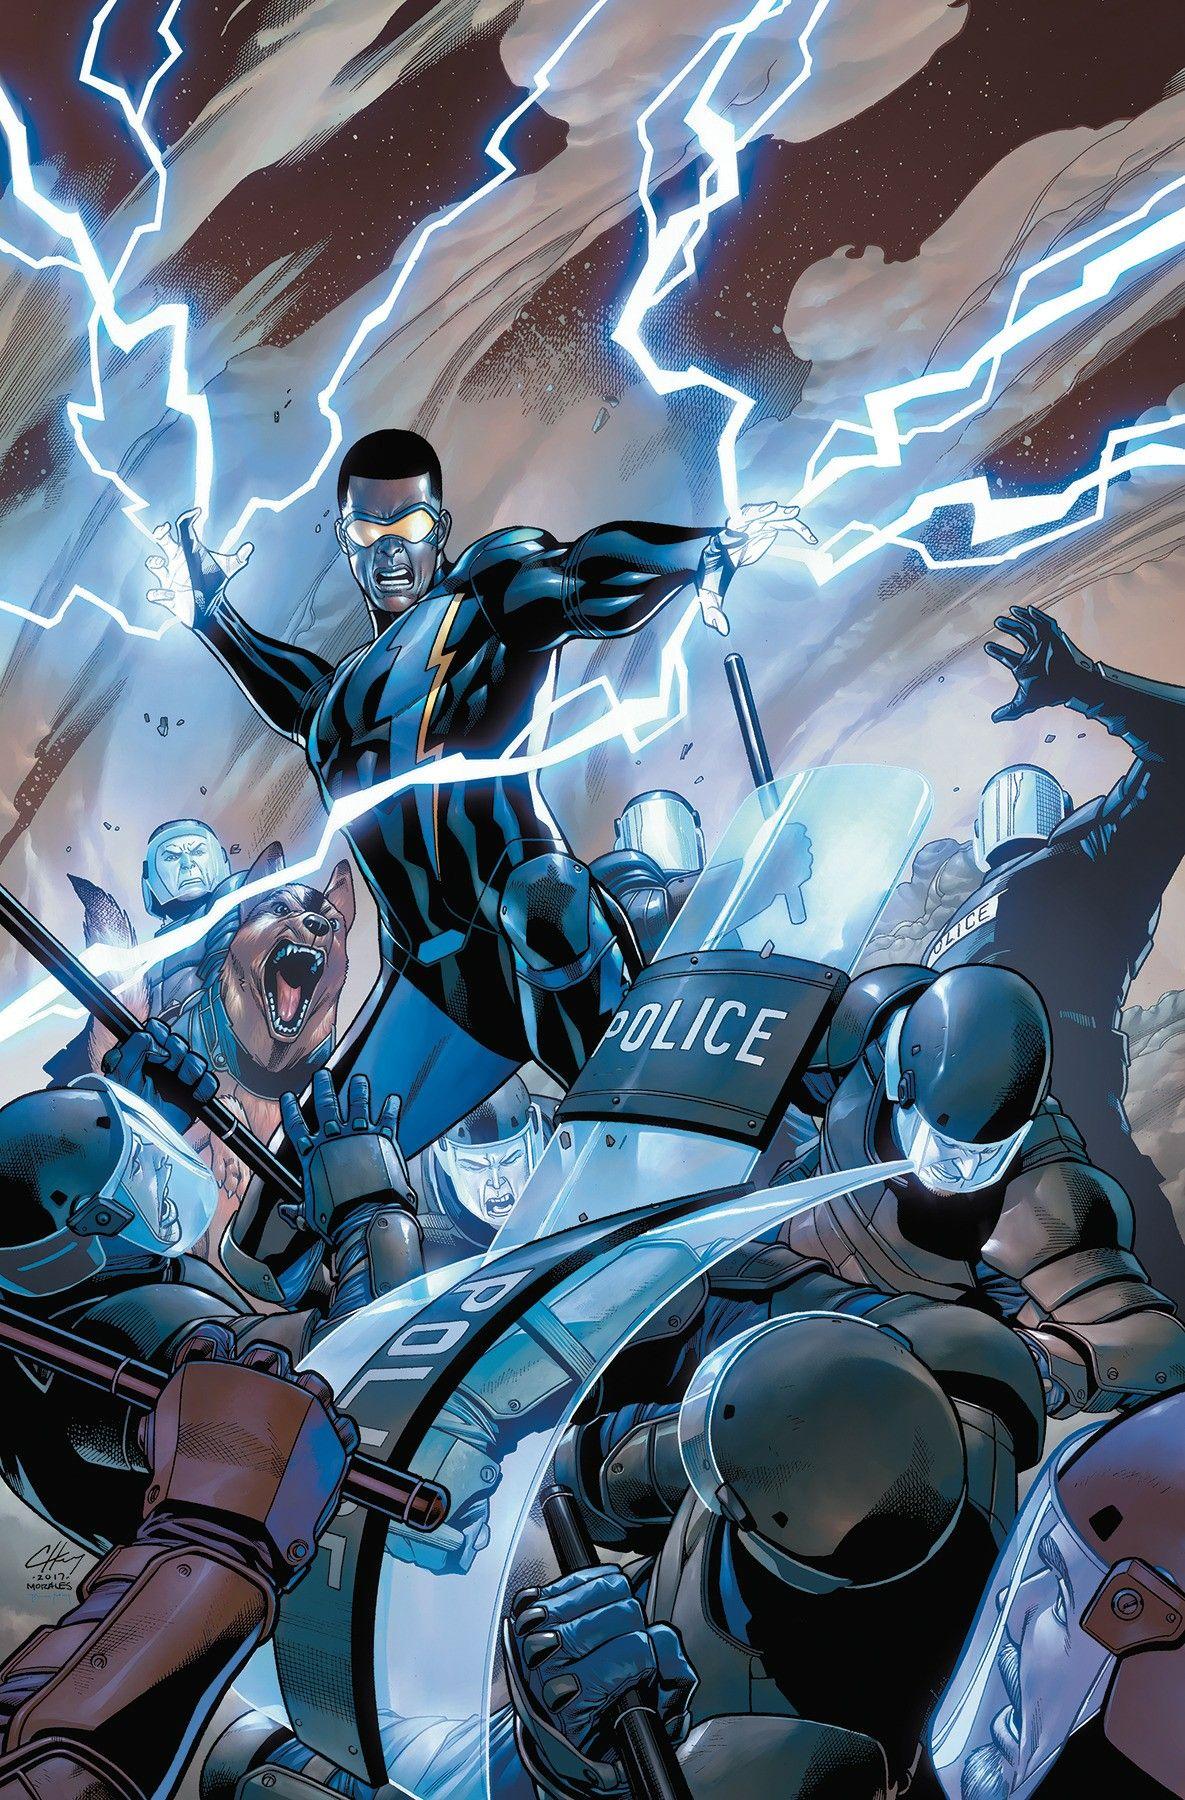 Pin by Insta: Xdubrocq on Marvel Universe   Xmen comics